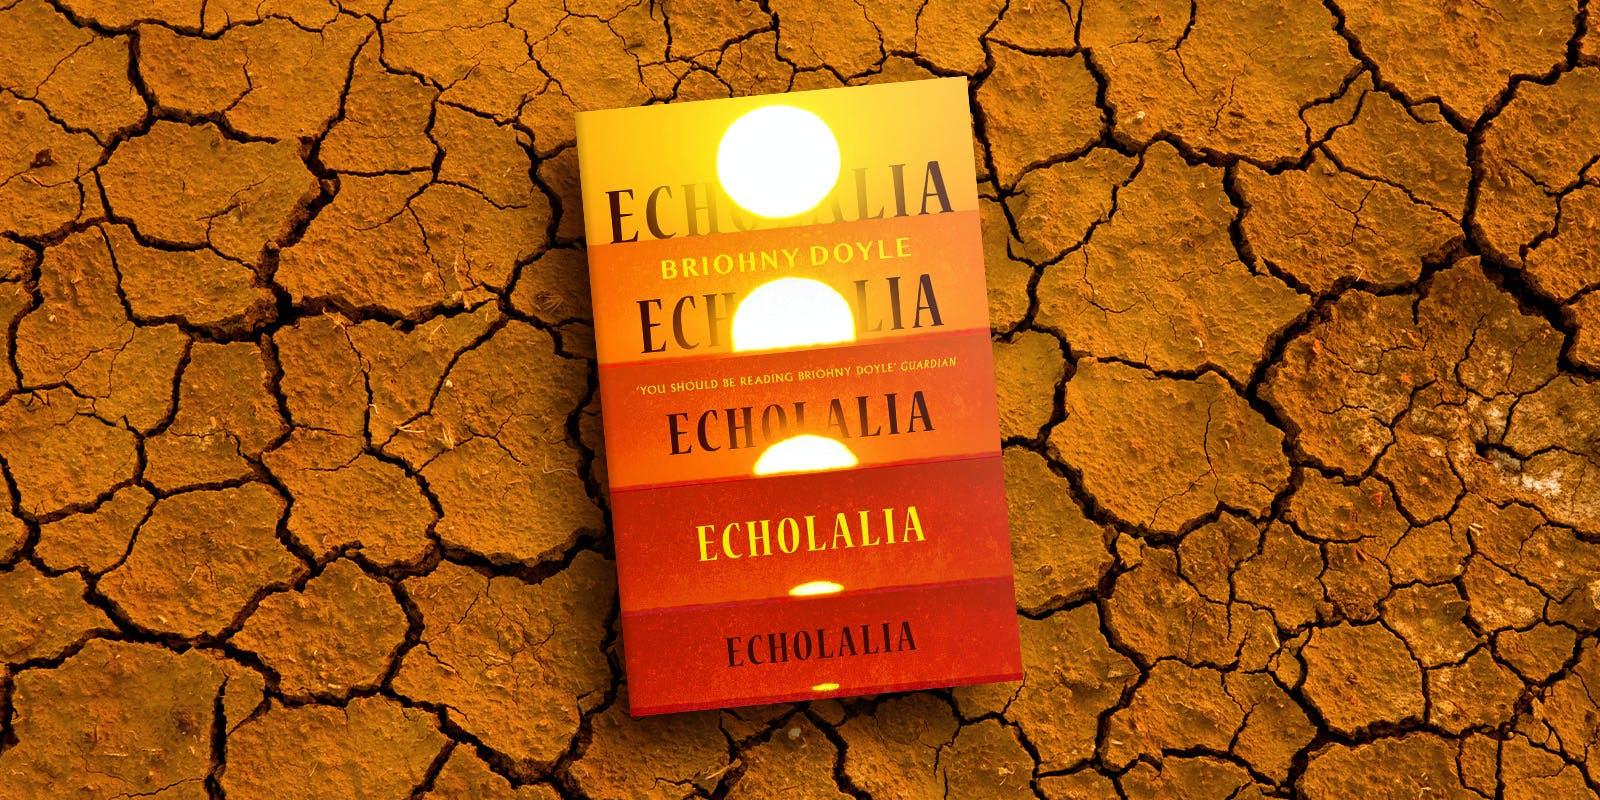 Echolalia book club notes